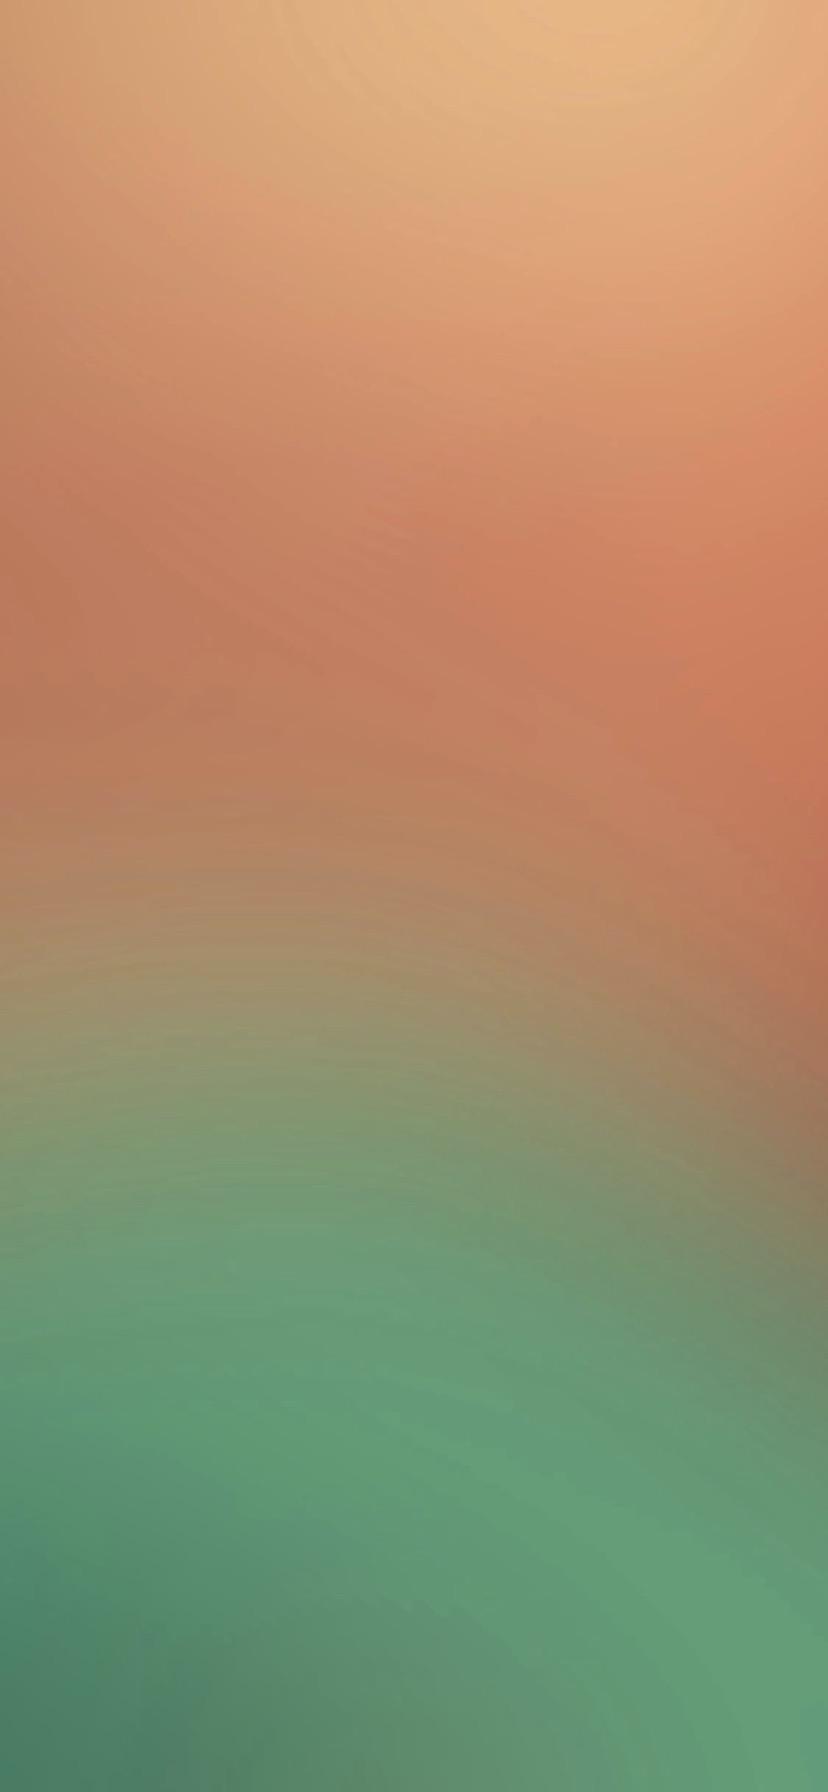 iPhone XR 壁紙 wallpaper 0083